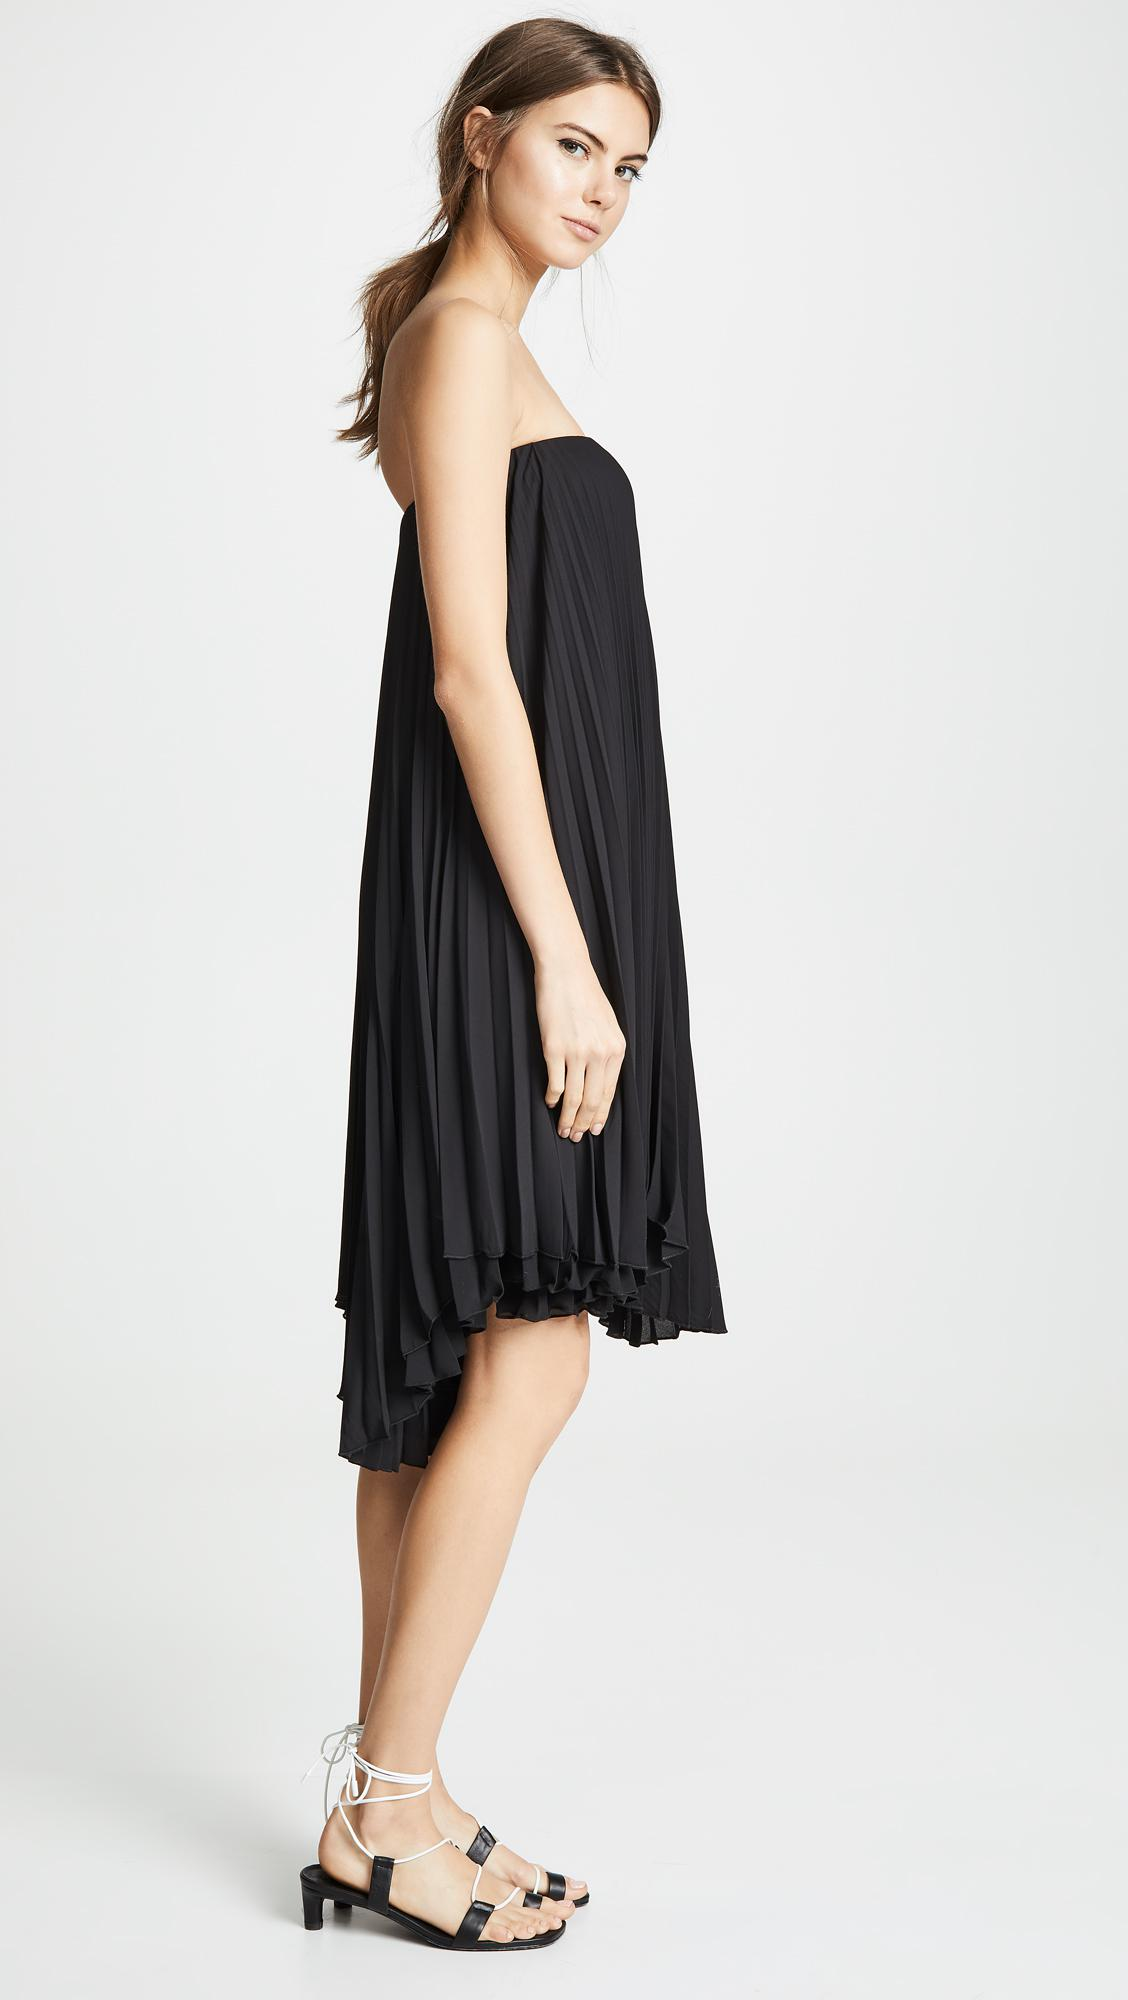 1a1dcb5c4a Loyd Ford Pleated Mini Dress in Black - Lyst